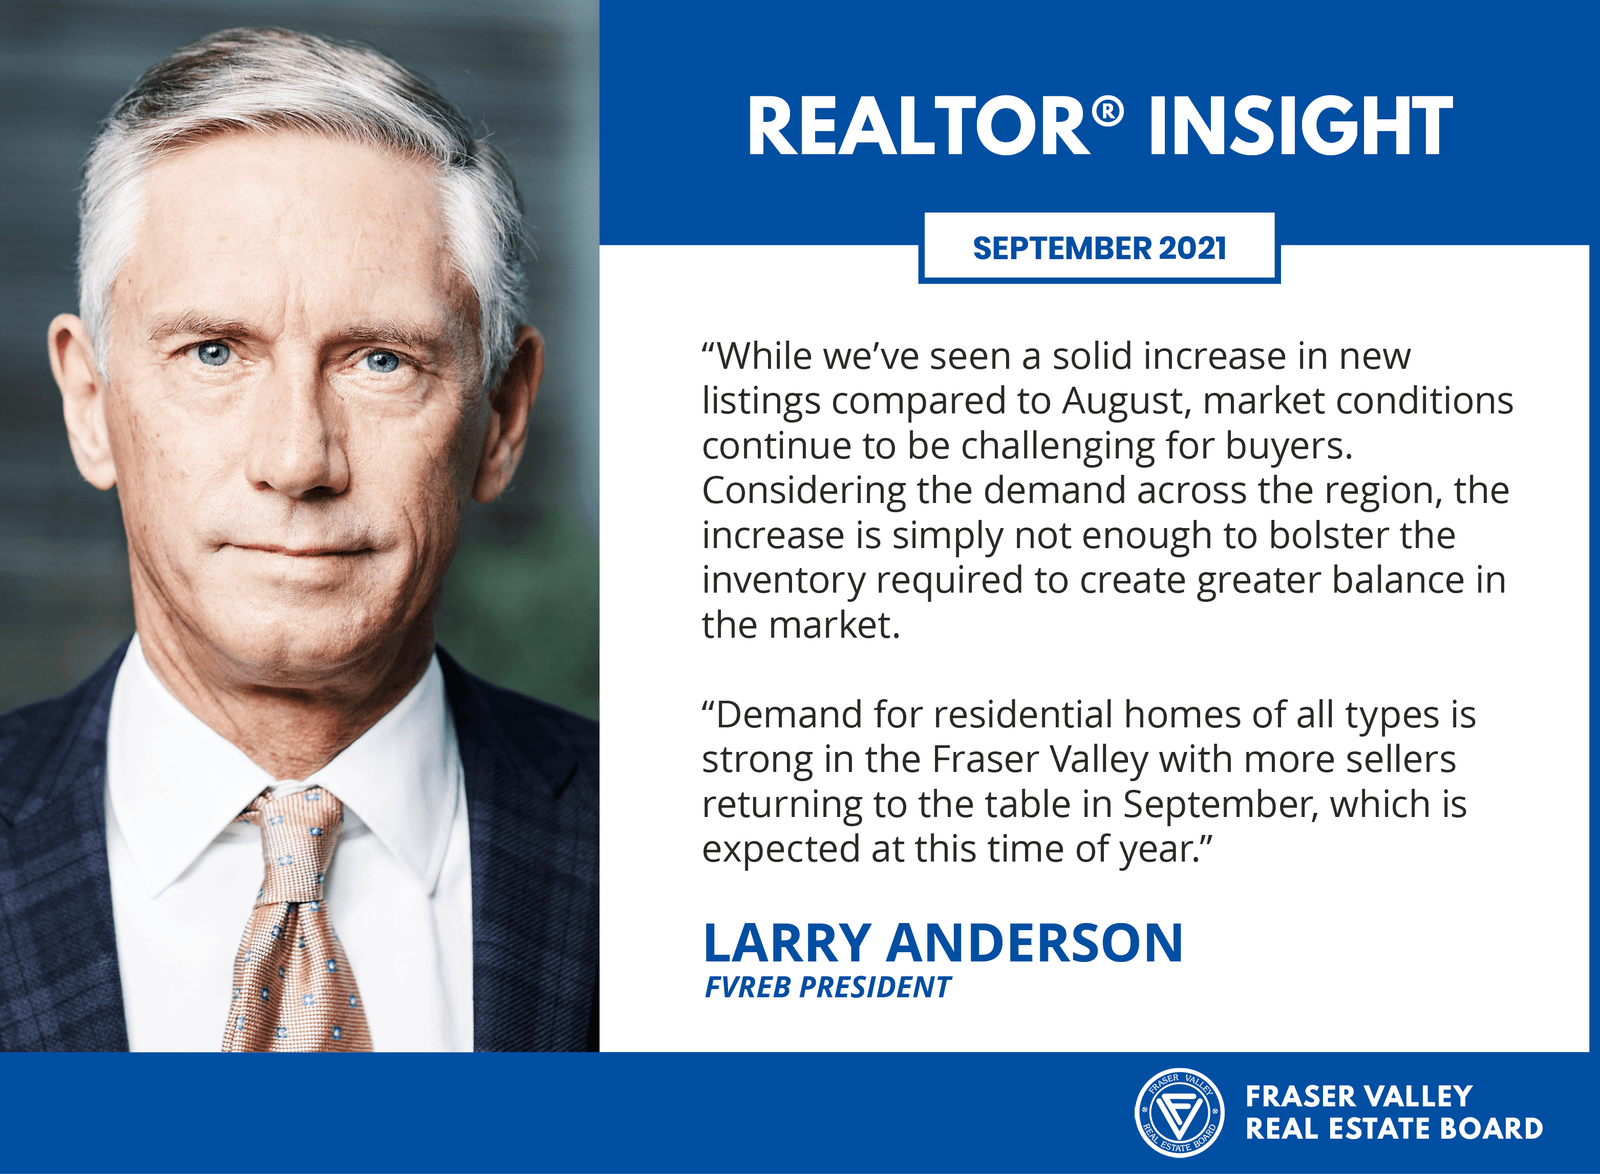 Fraser Valley Housing Market Report - Realtor Insight - September 2021